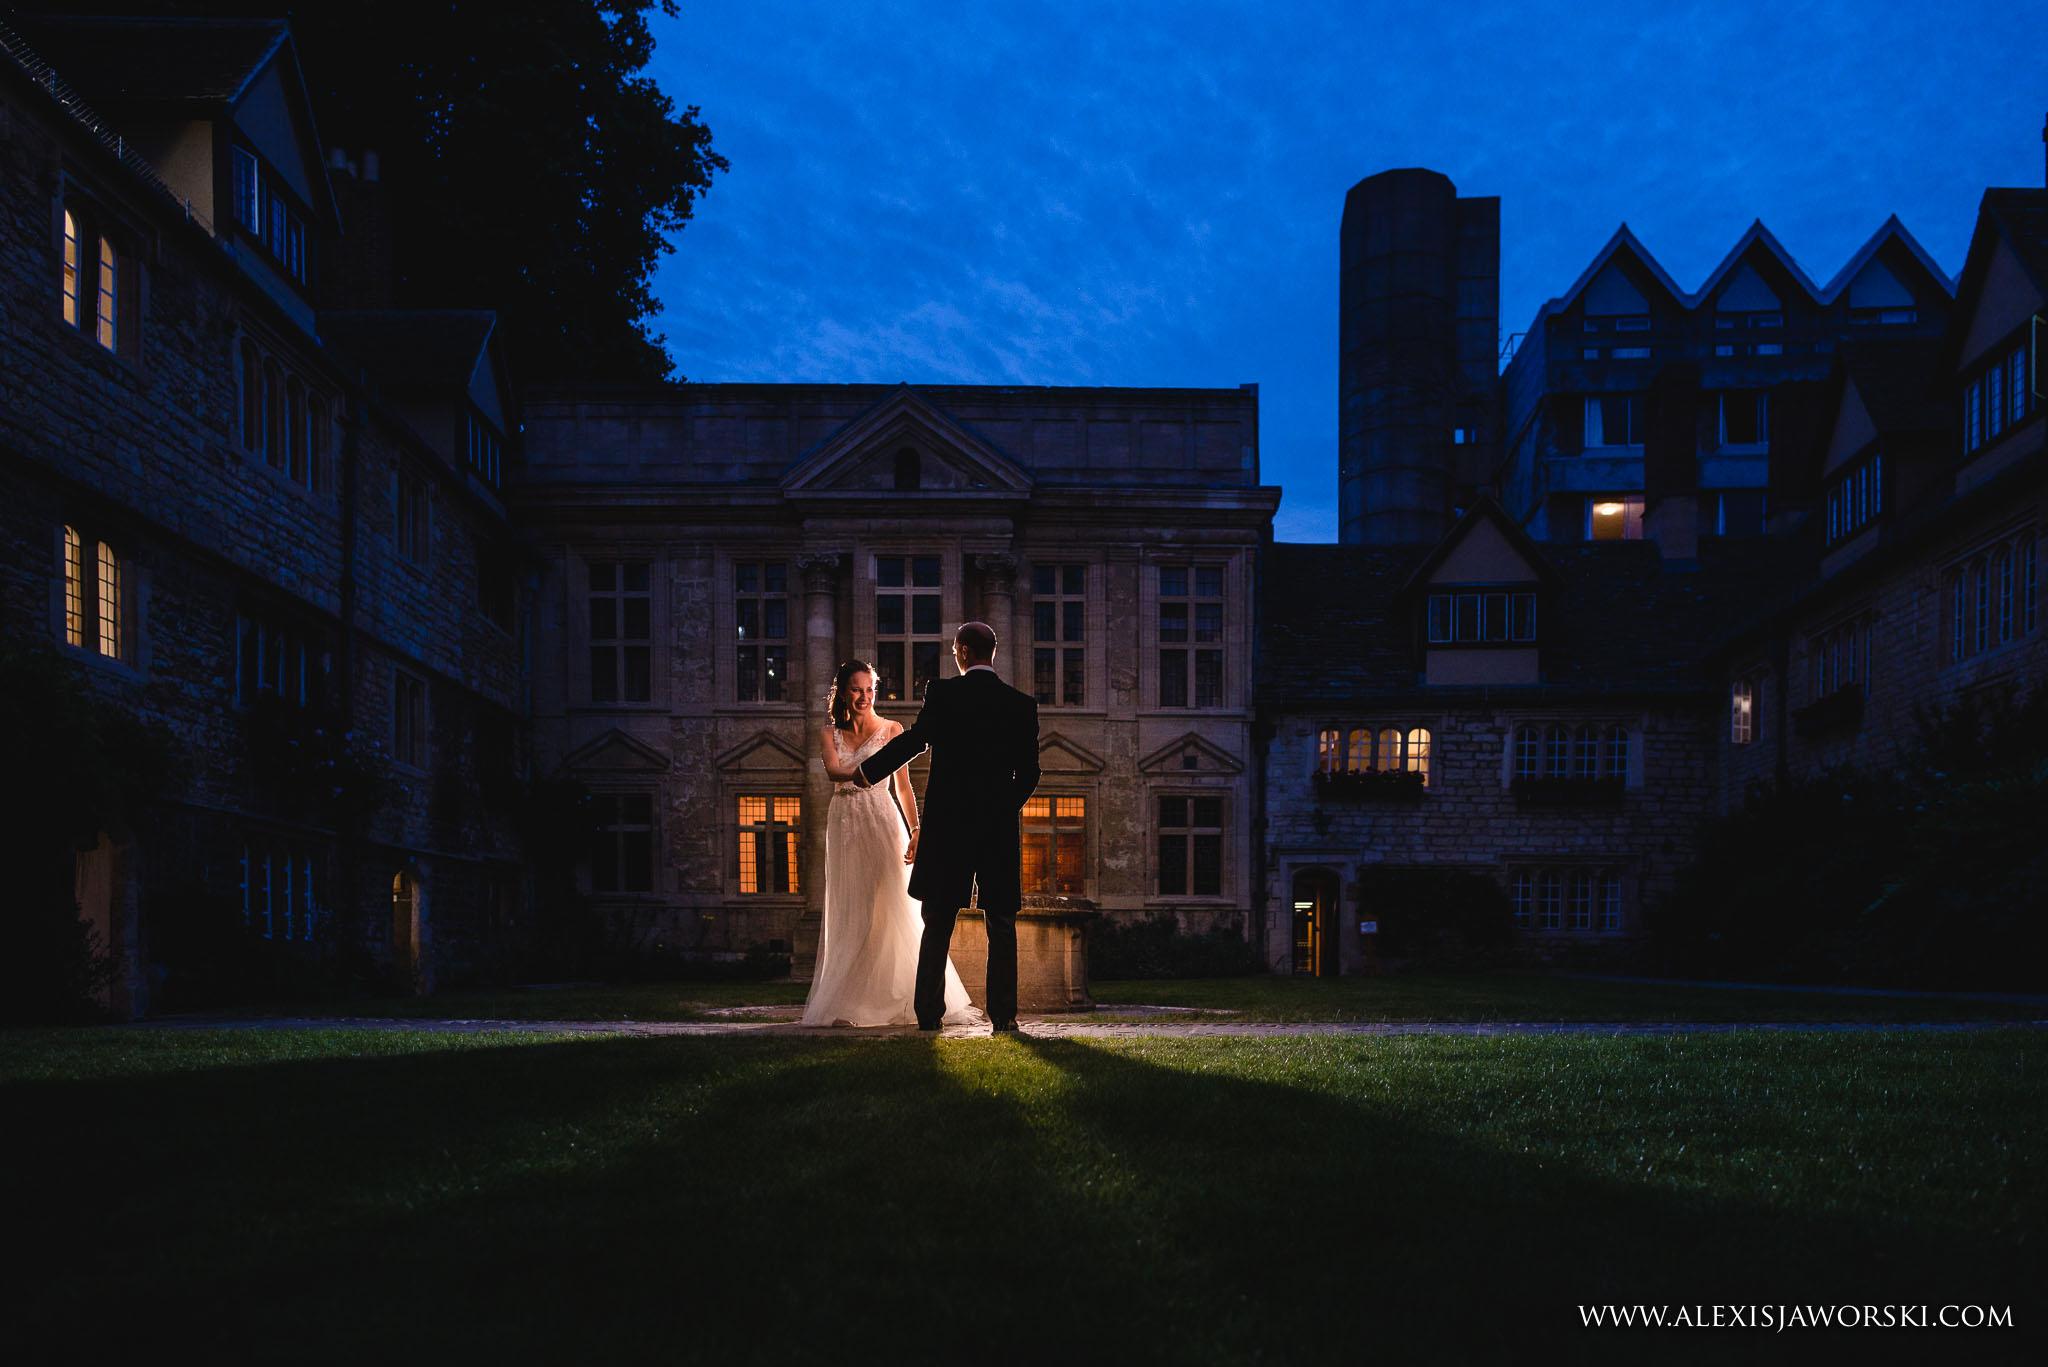 night portrait f bride and groom